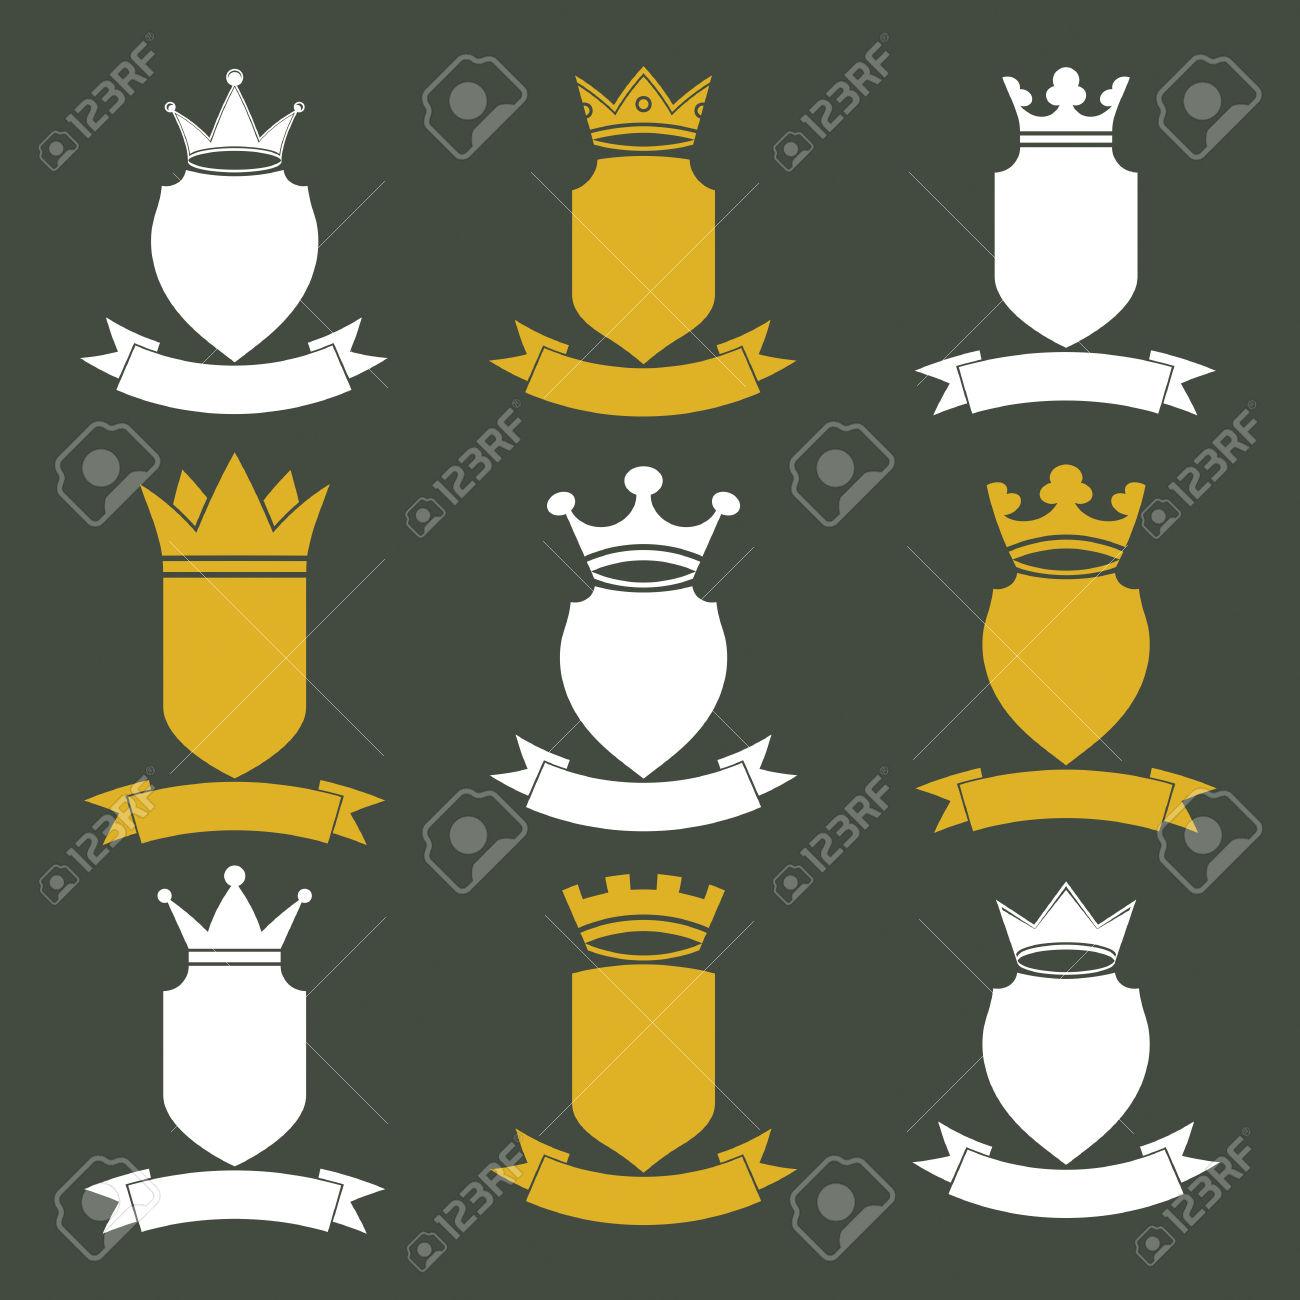 Collection Of Empire Design Elements. Heraldic Royal Coronet.